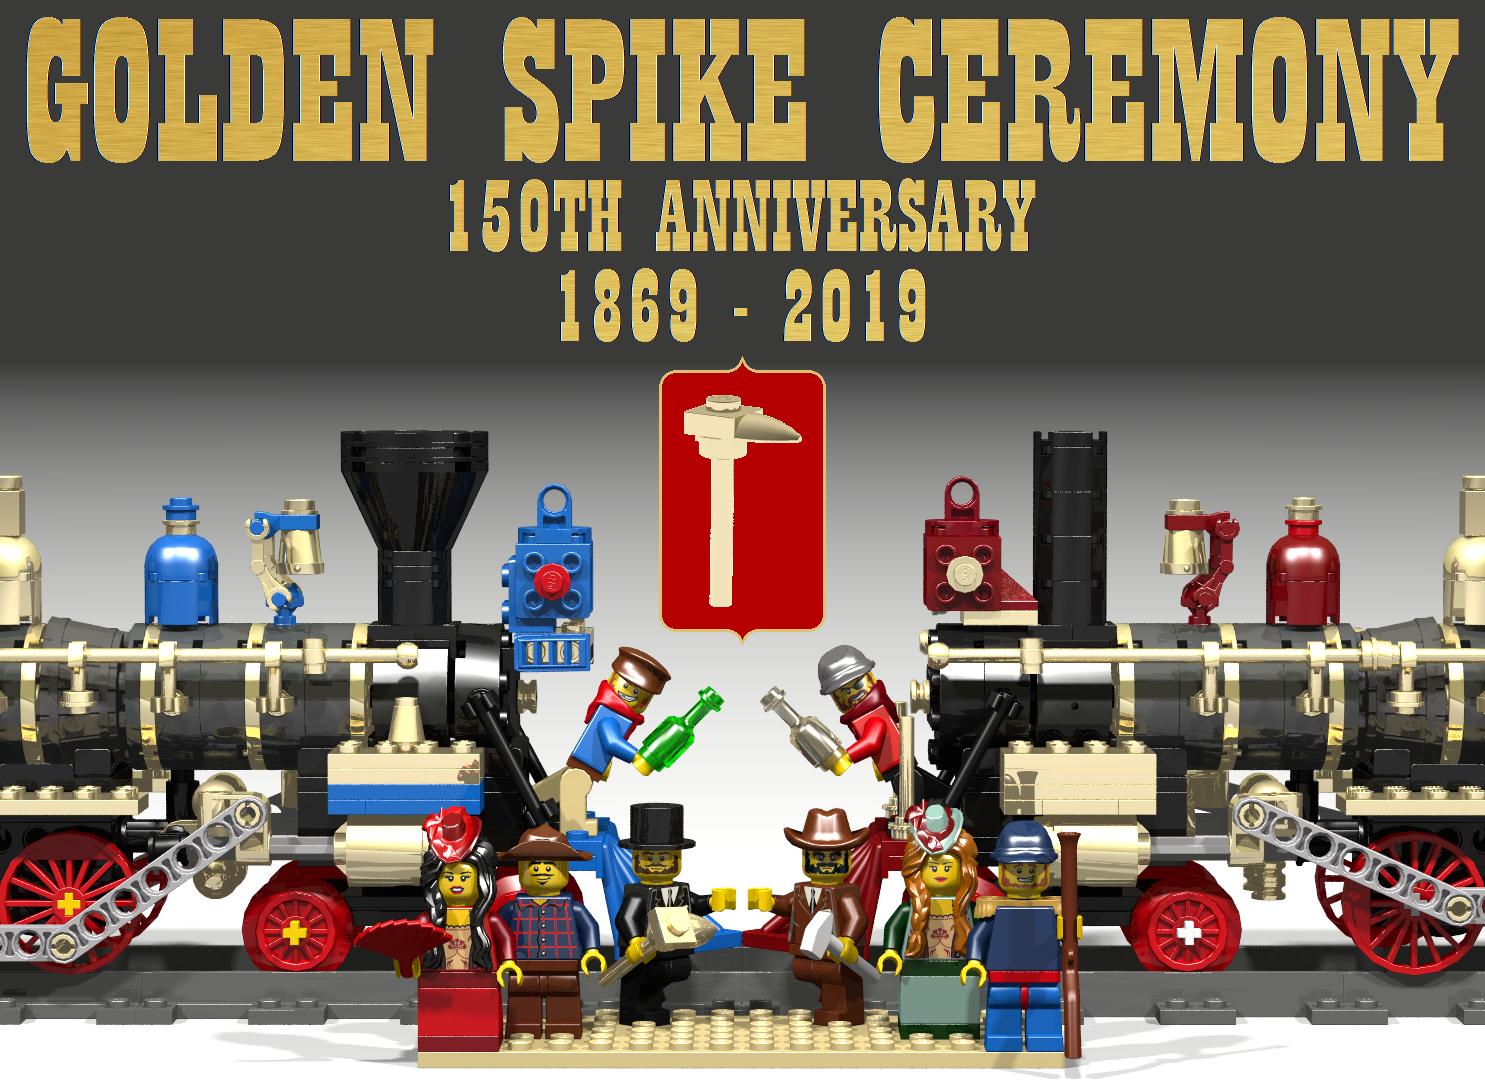 Lego Golden Spike Ceremony